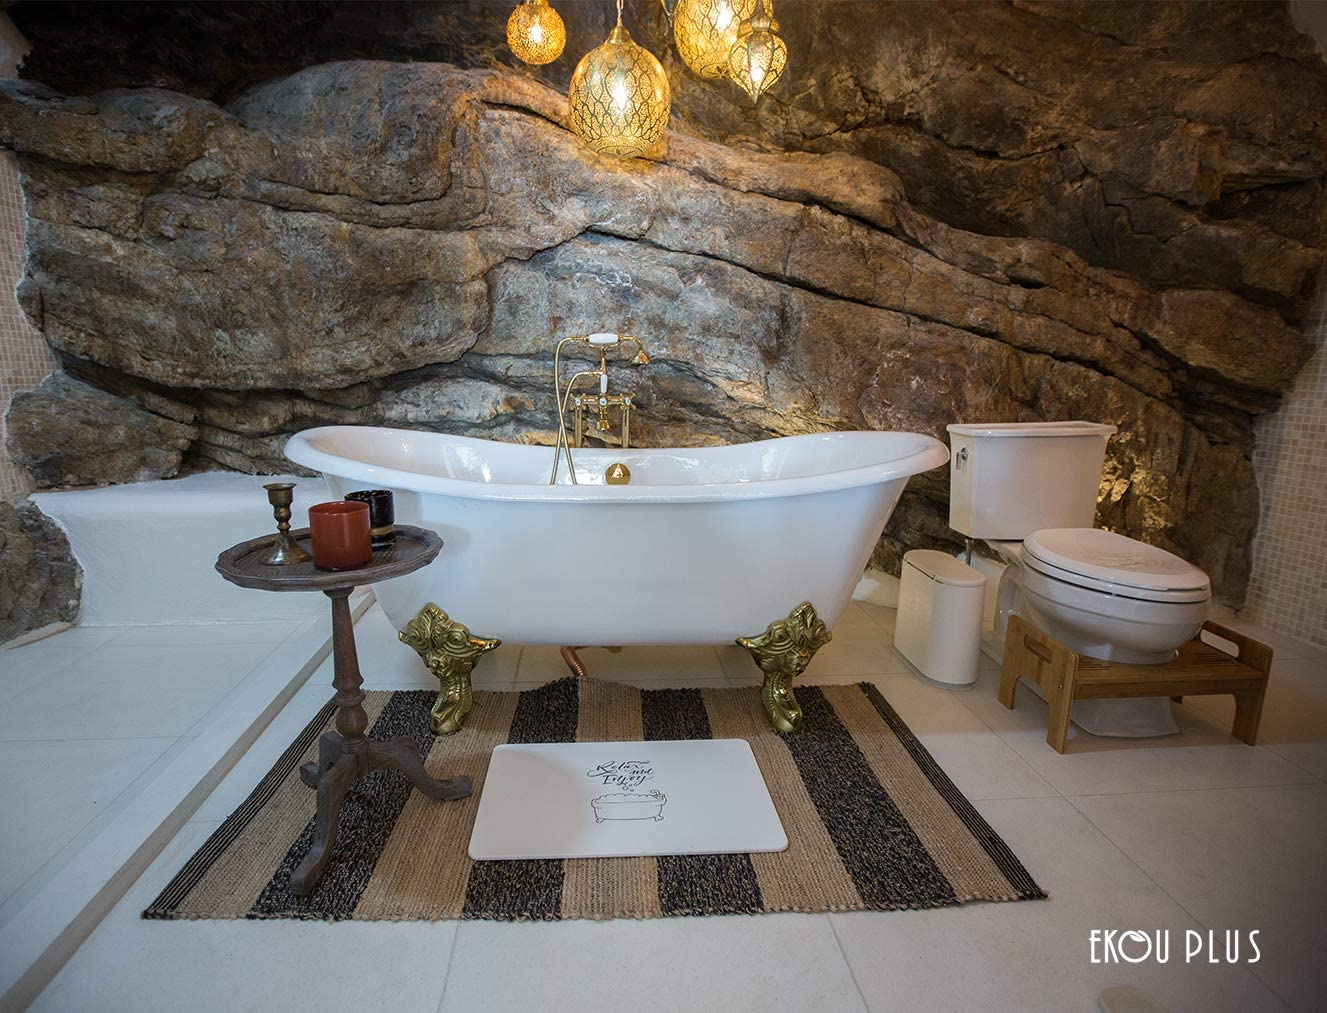 EKOU PLUS Bath Mat Diatomite Japanese Quality Fast Drying Bathroom Self-Refreshing Hard Shower Mats White, 23.6X15.3X0.35 Inch